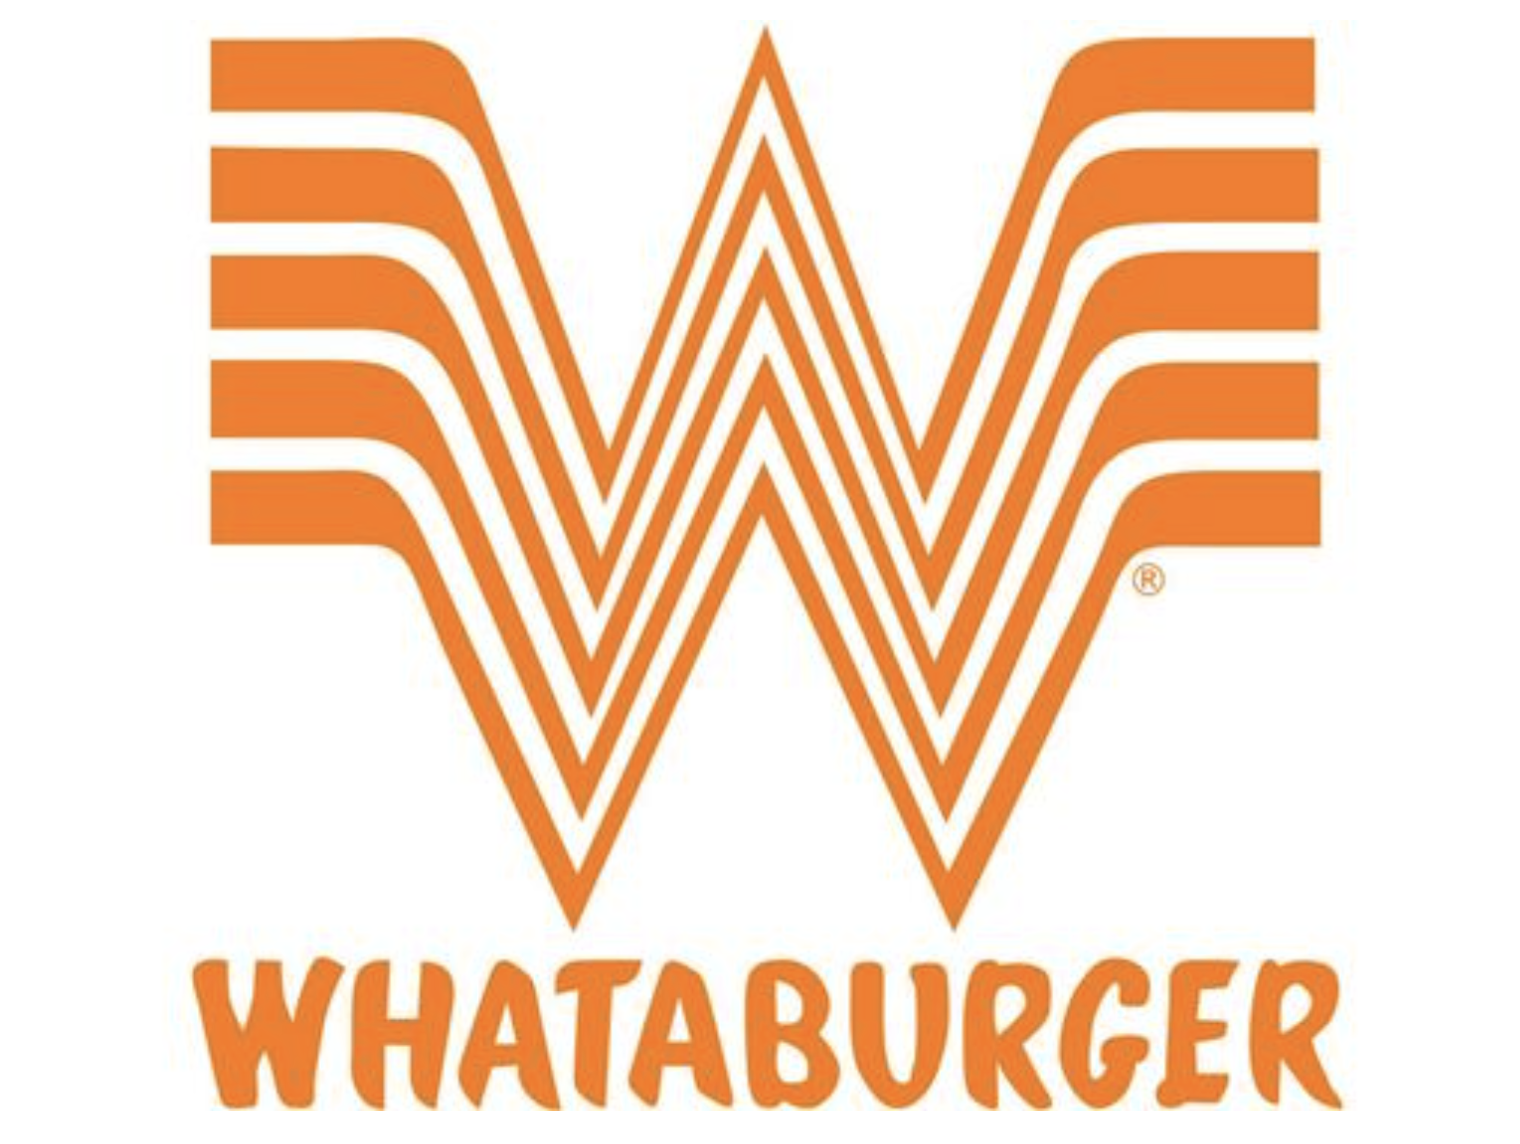 WIN WHATABURGER!